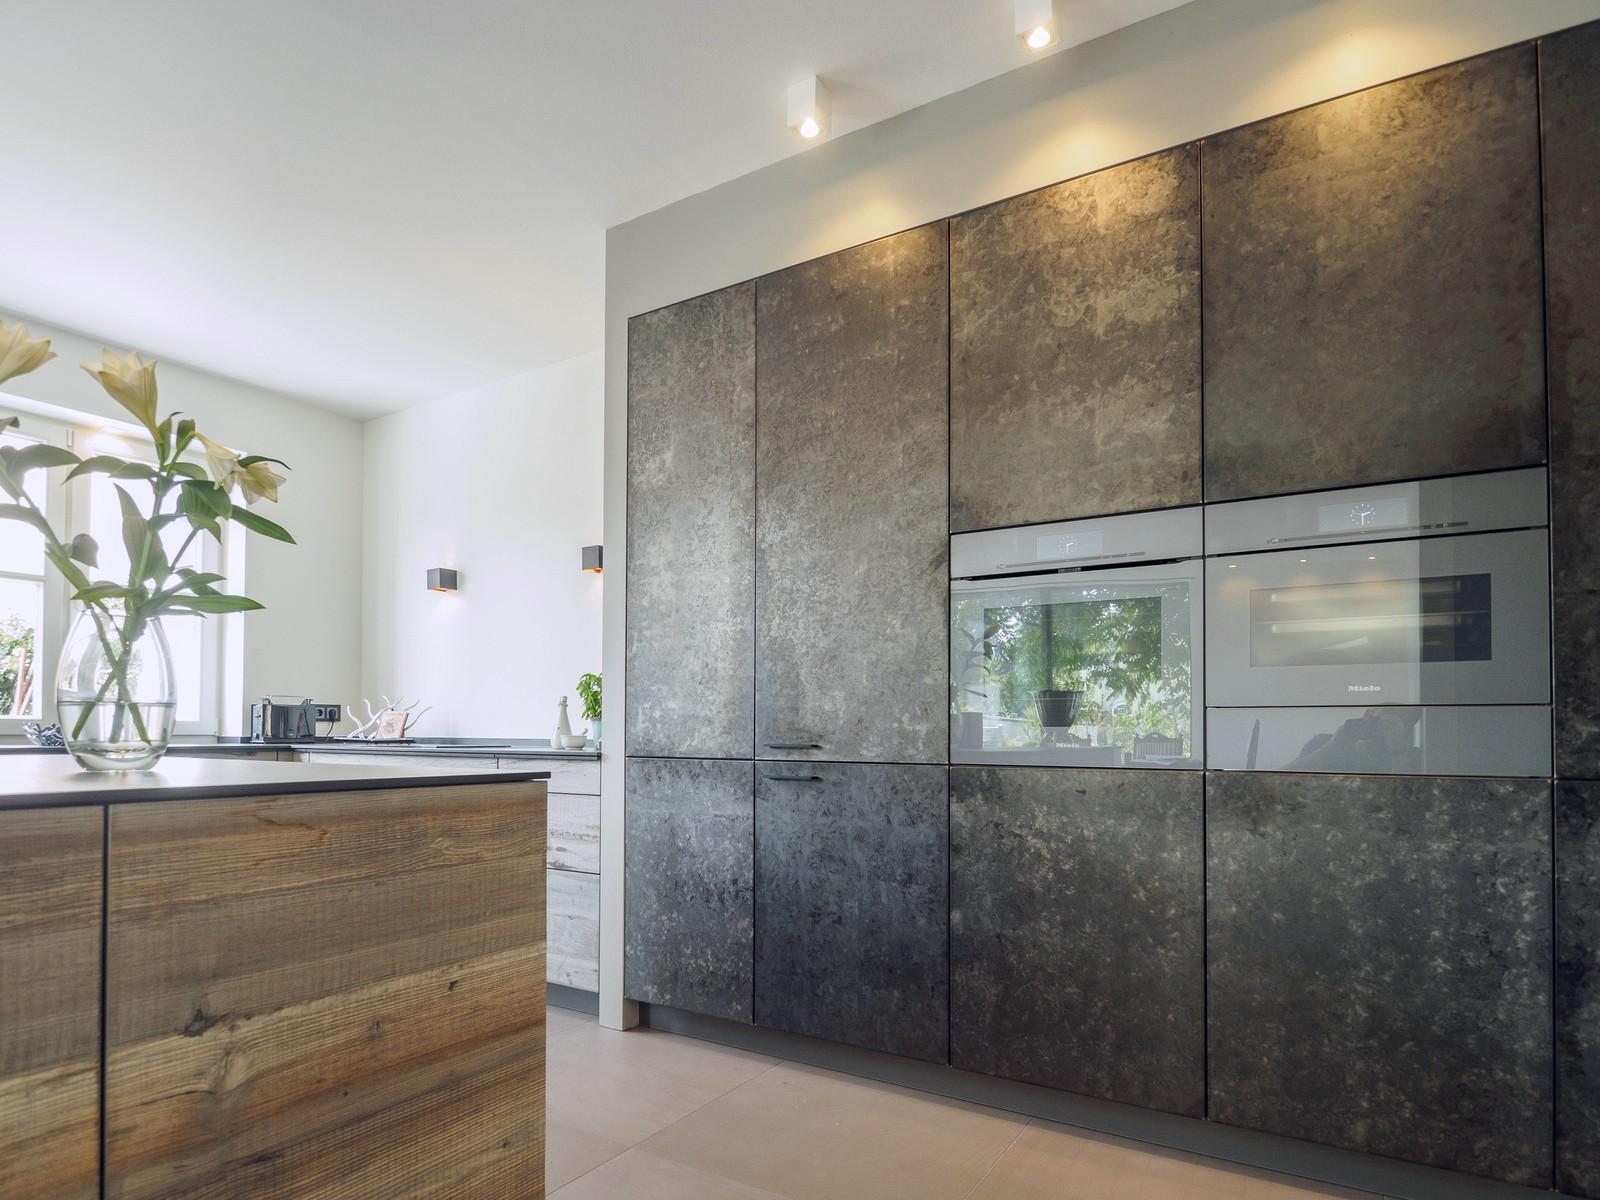 Kueche Exklusiv Design Fronten Holz Furnier Sonnenverbrannt Stahl Keramik Arbeitsplatte Miele 11